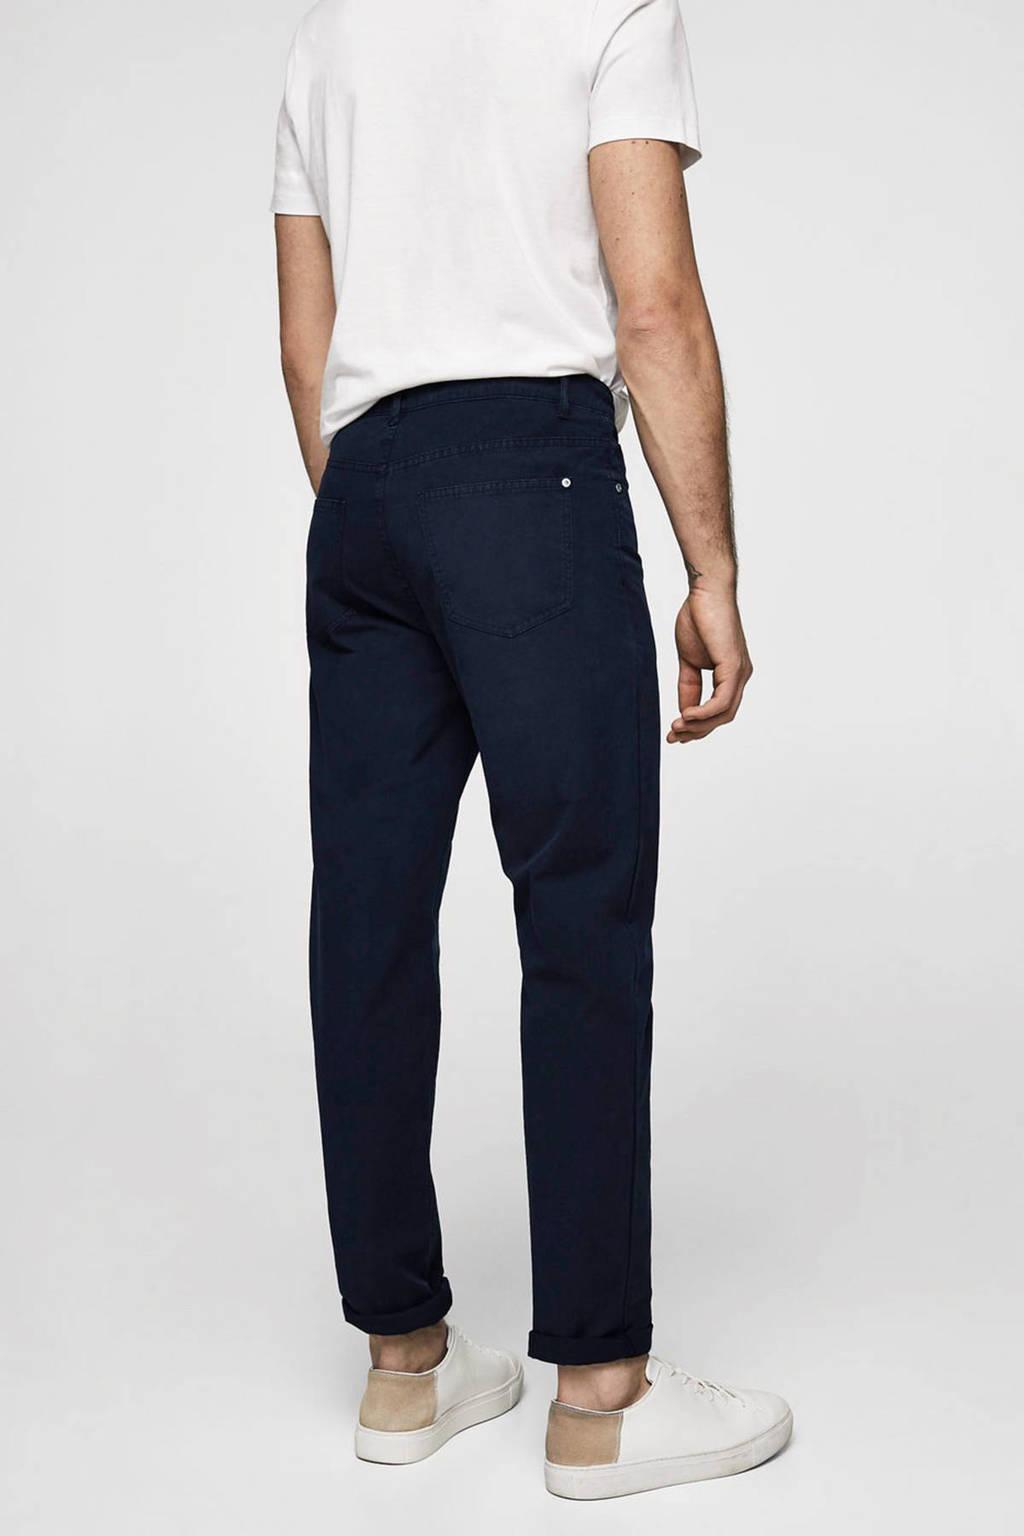 Beste Mango Man slim fit broek met hoge taille marineblauw   wehkamp TZ-27